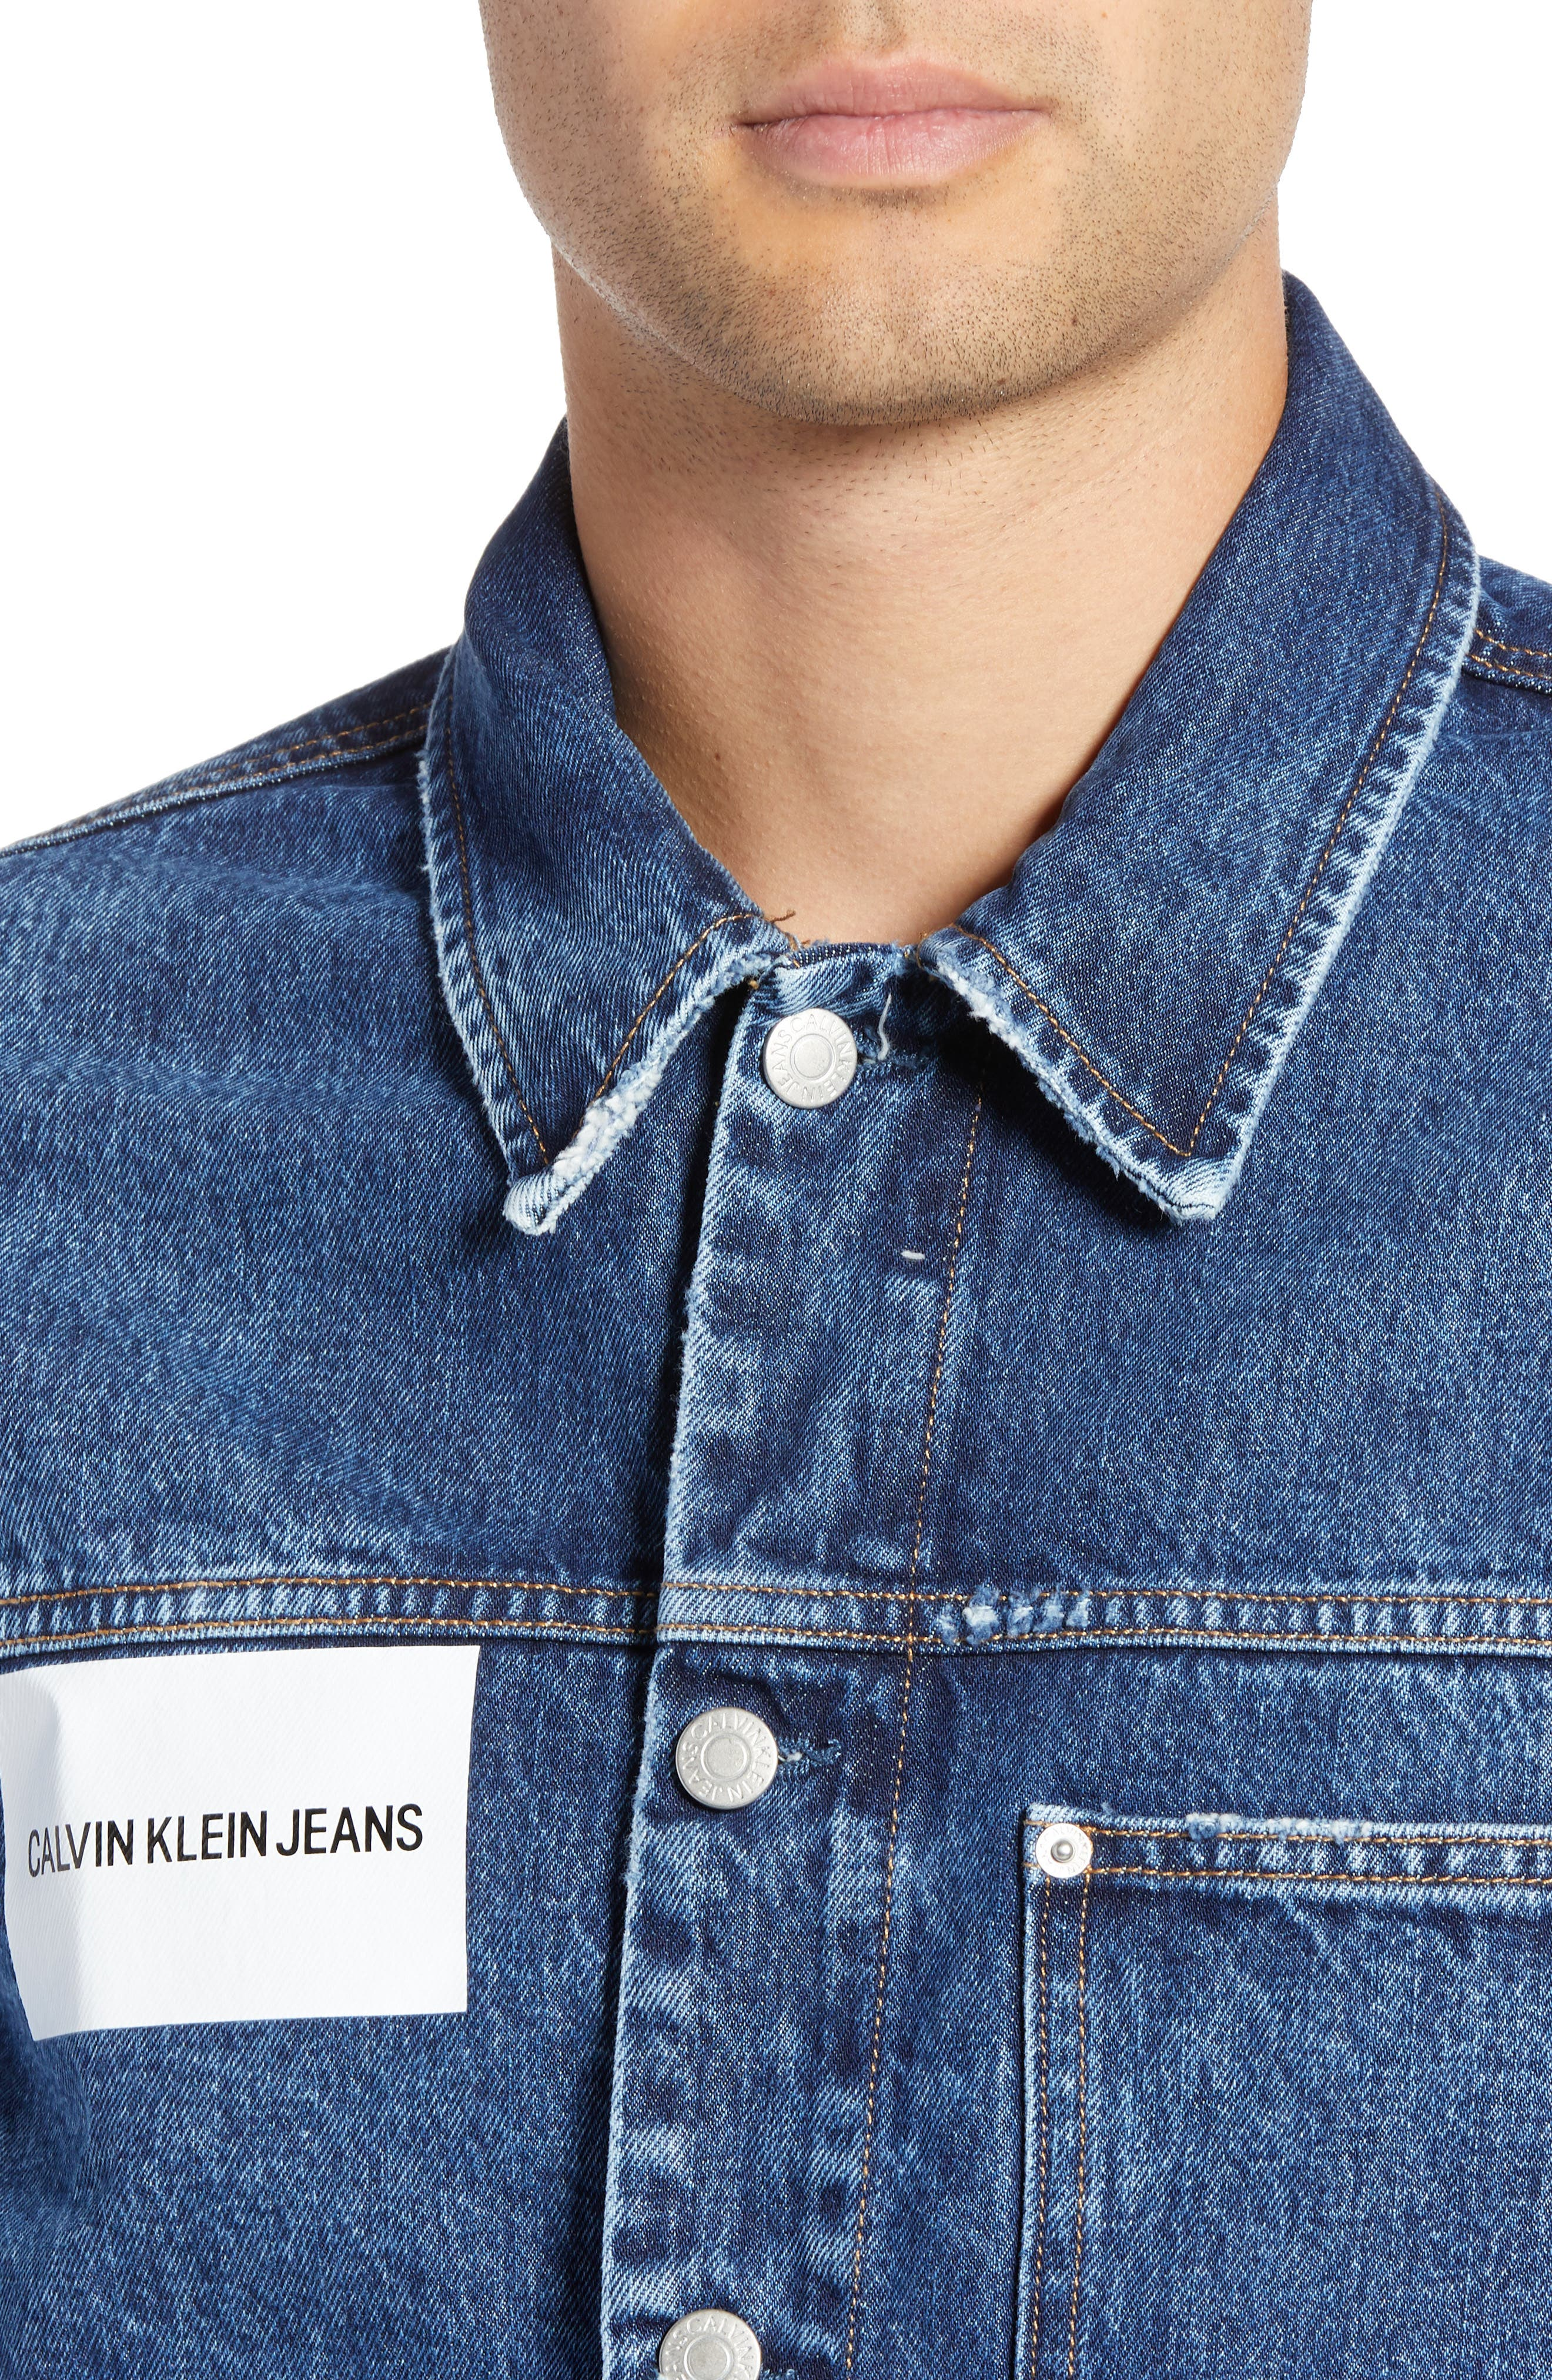 CALVIN KLEIN JEANS,                             Patch One-Pocket Denim Jacket,                             Alternate thumbnail 5, color,                             400